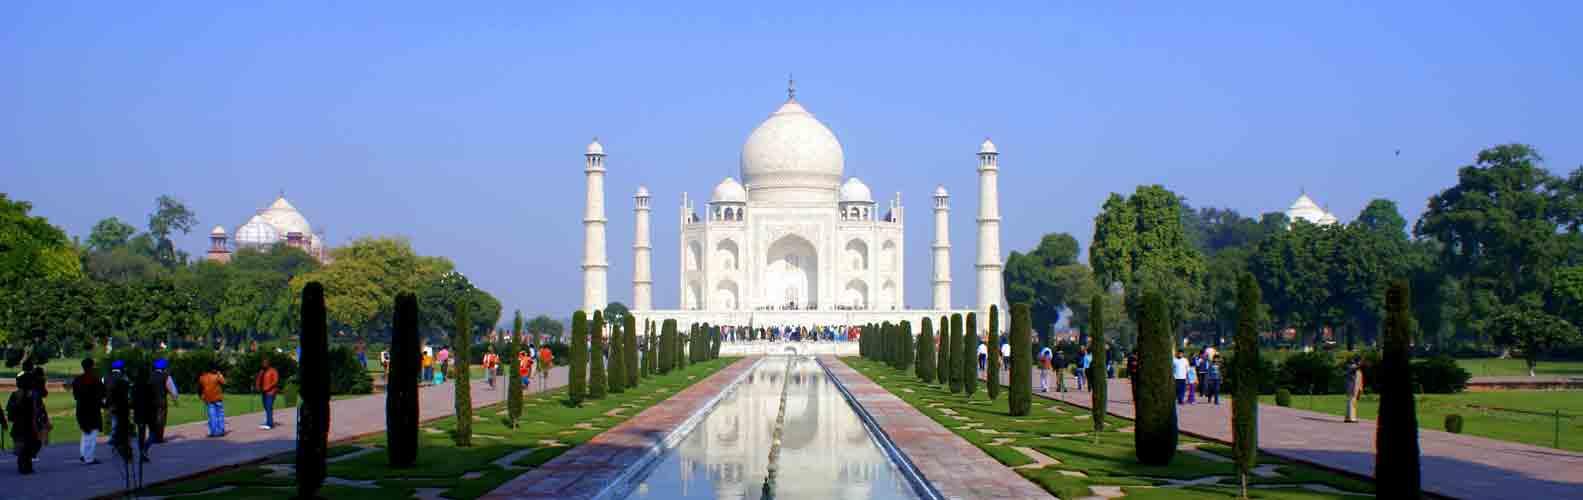 MAKRANA MARBLE IN INDIA BY BHANDARI MARBLE GROUP INDIA RAJASTHAN KISHANGARH